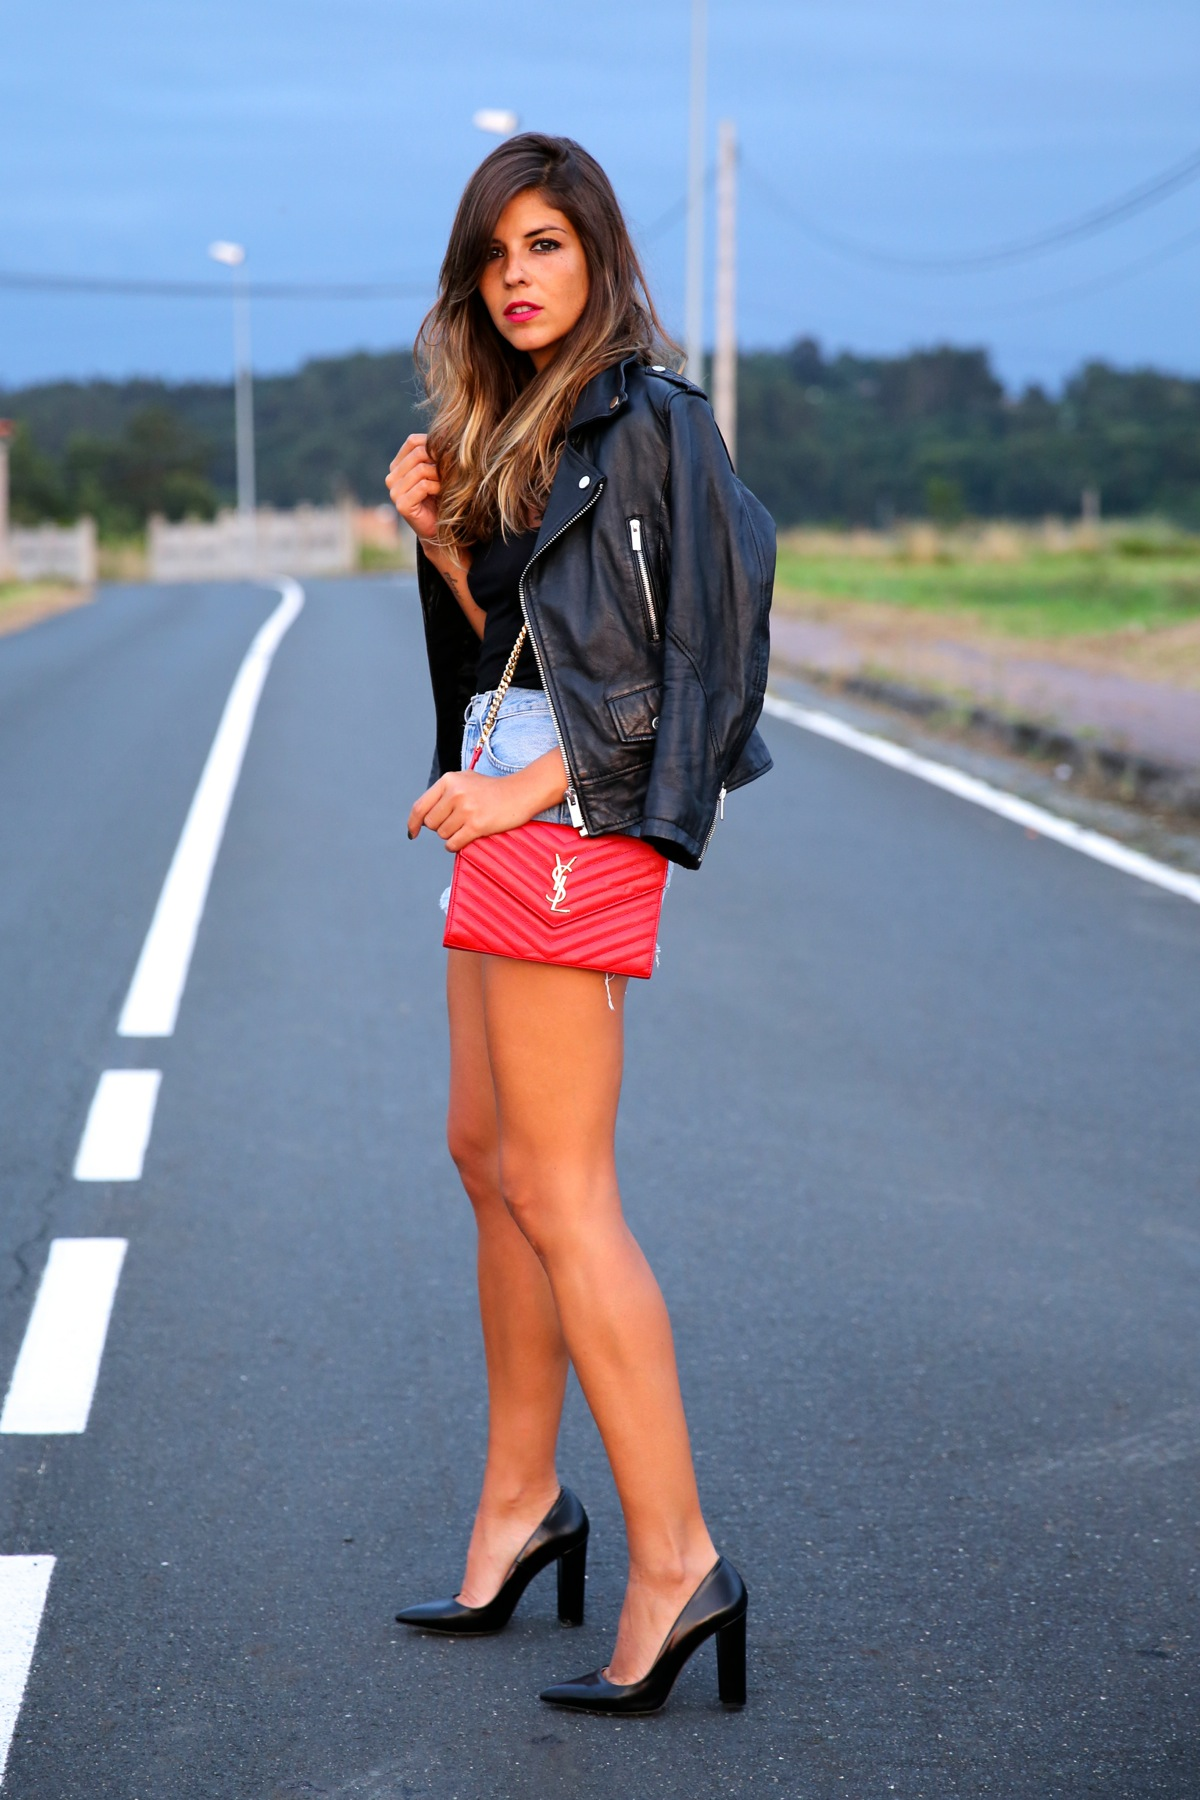 trendy_taste-look-outfit-street_style-ootd-blog-blogger-fashion_spain-moda_españa-denim_shorts-shorts_vaqueros-chaqueta_cuero-leather_jacket-ysl-saint_laurent-13